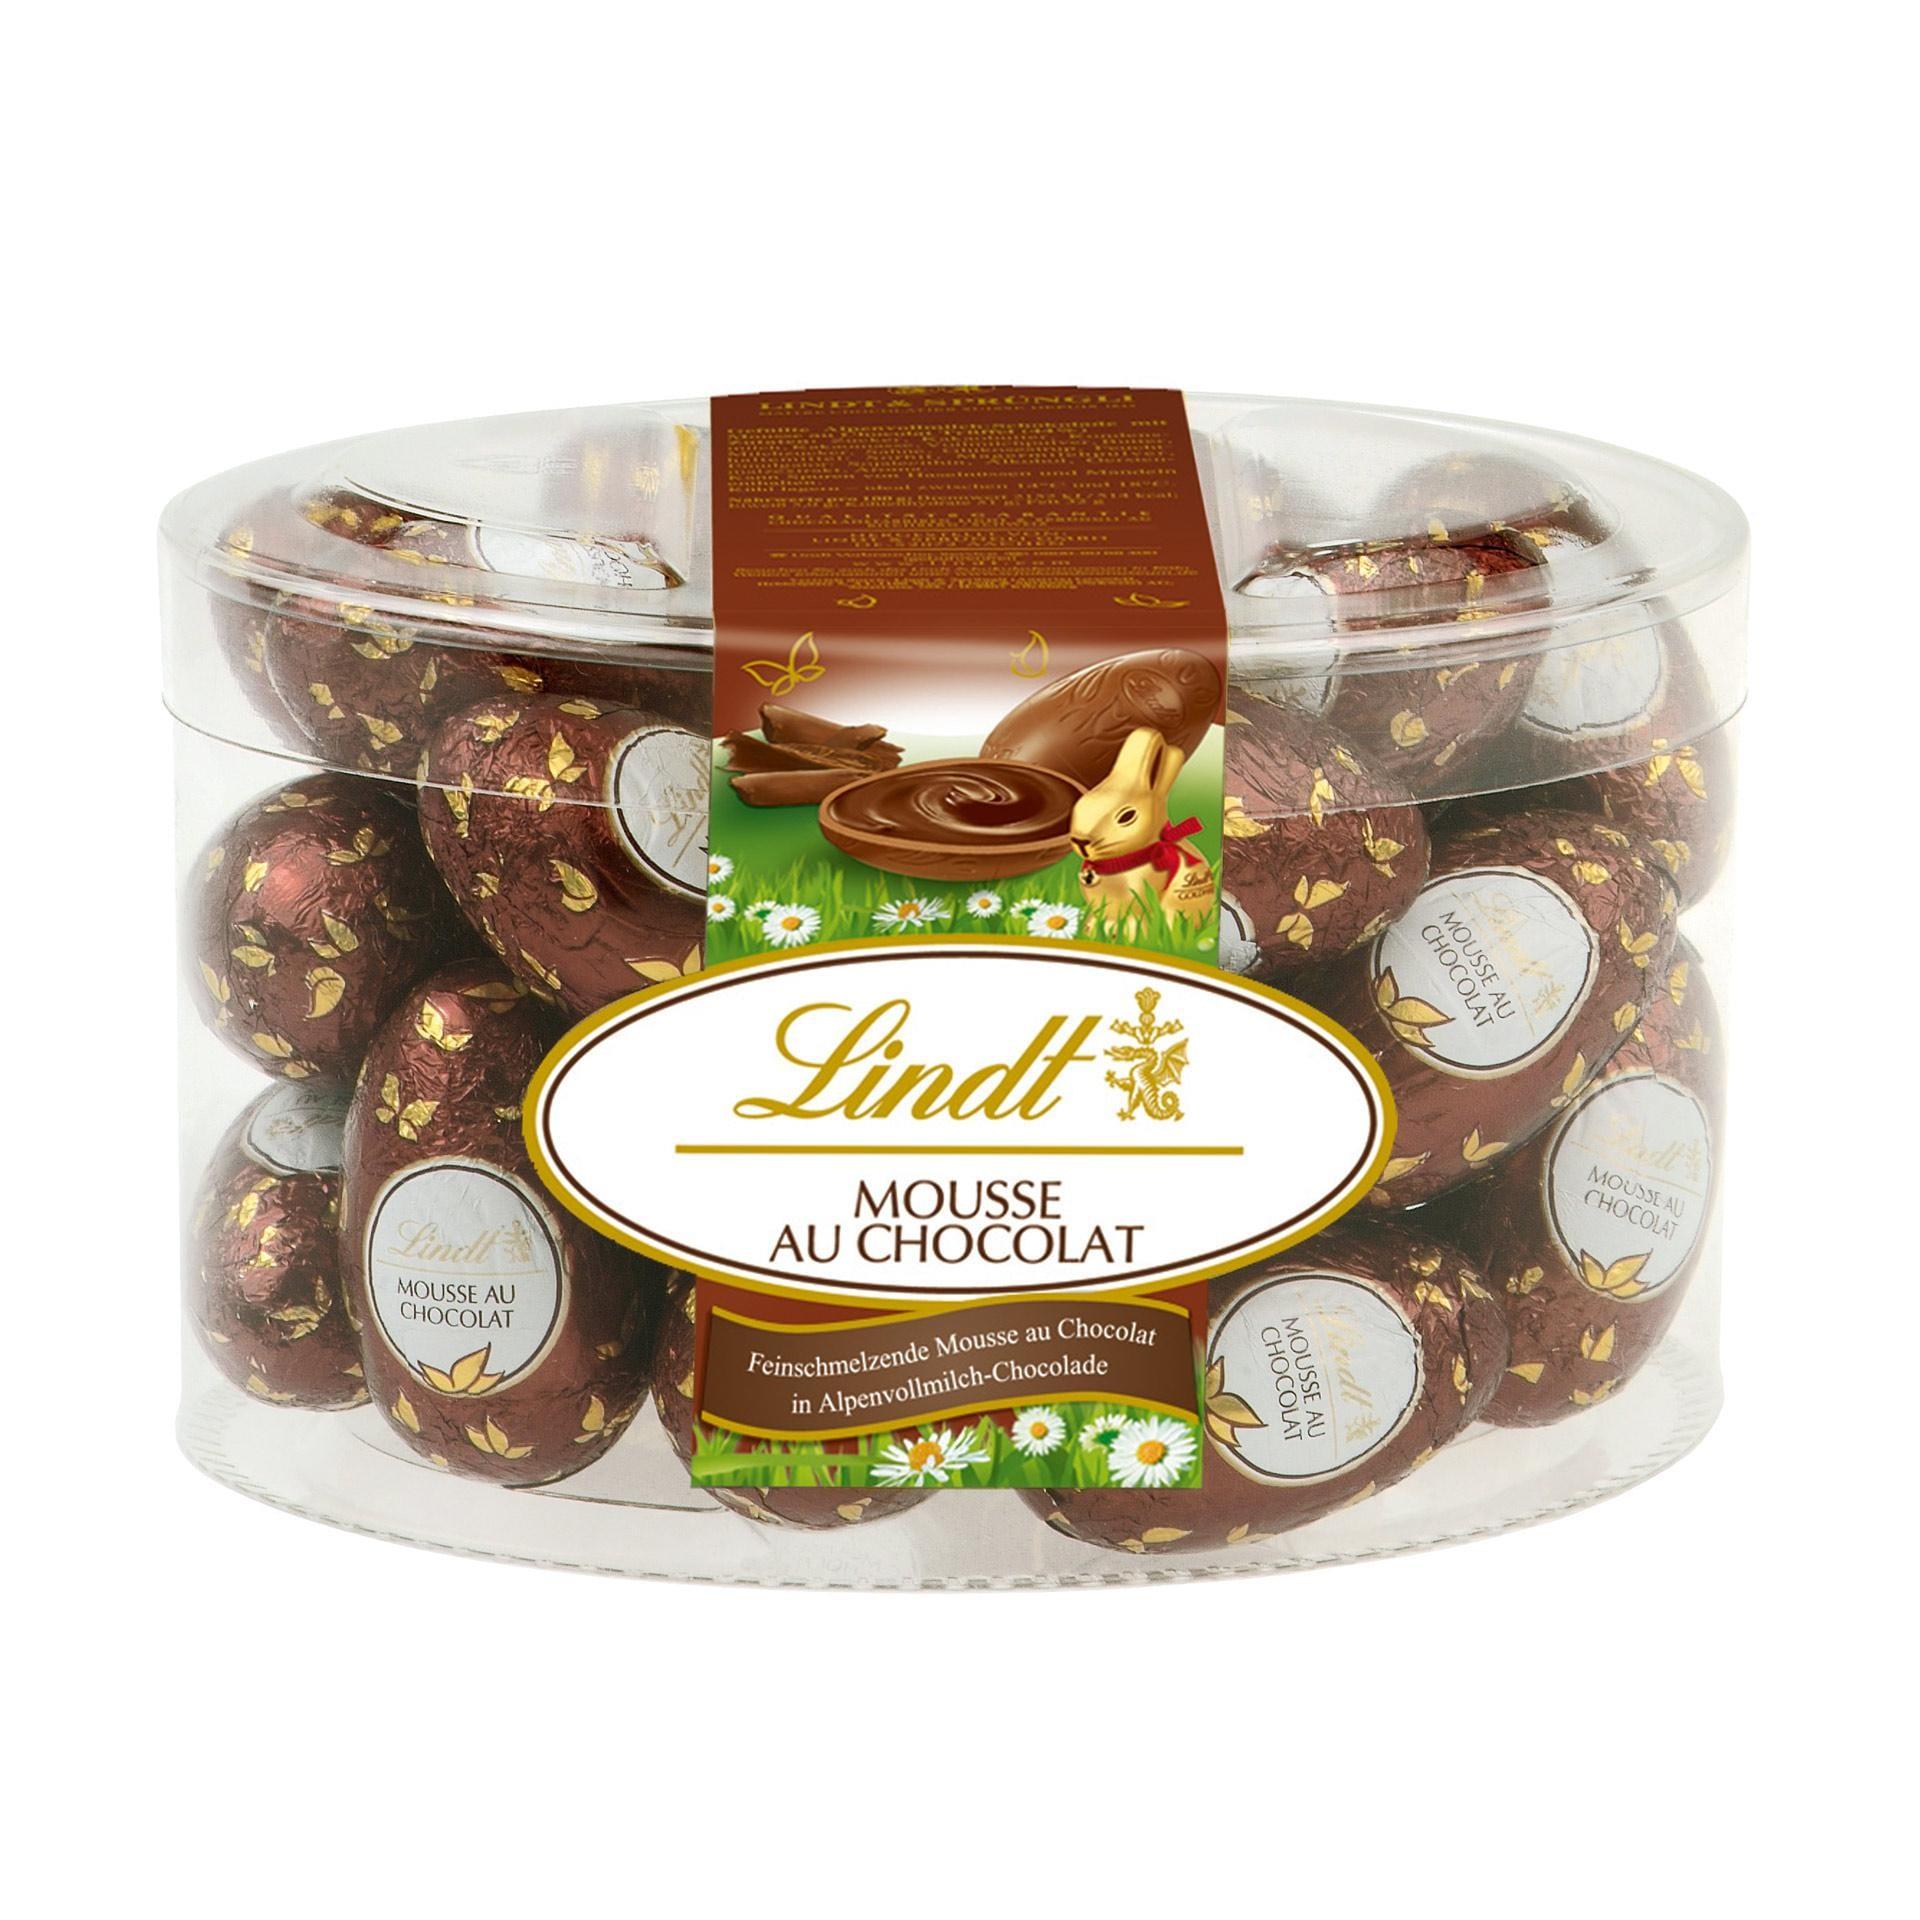 Lindt Mousse au Chocolat Trüffel-Eier 450g, 25 Stück